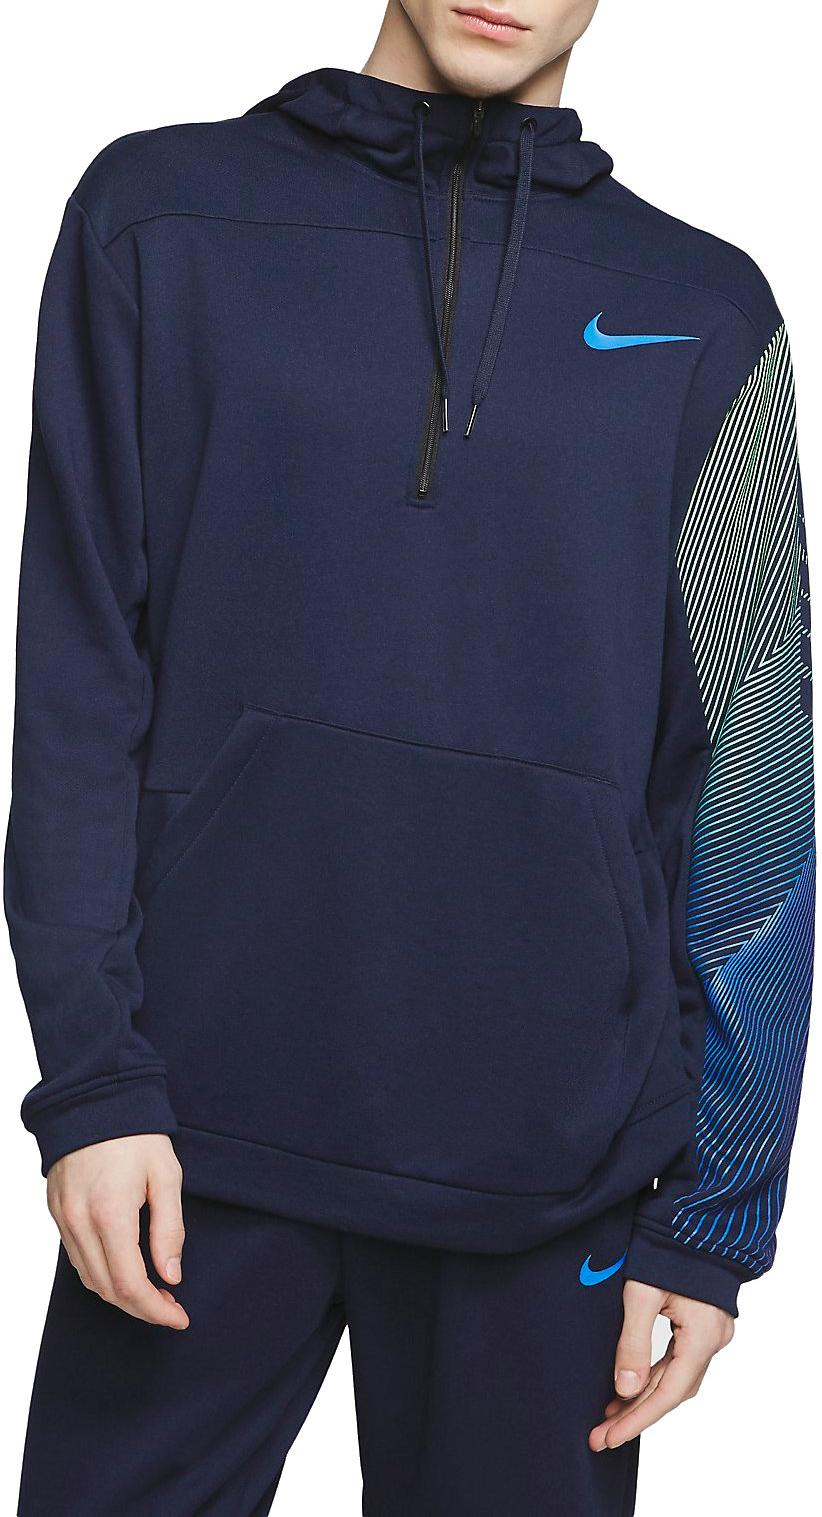 Hooded sweatshirt Nike M NK DRI FIT PULLOVER FLEECE TRAINING HOODIE